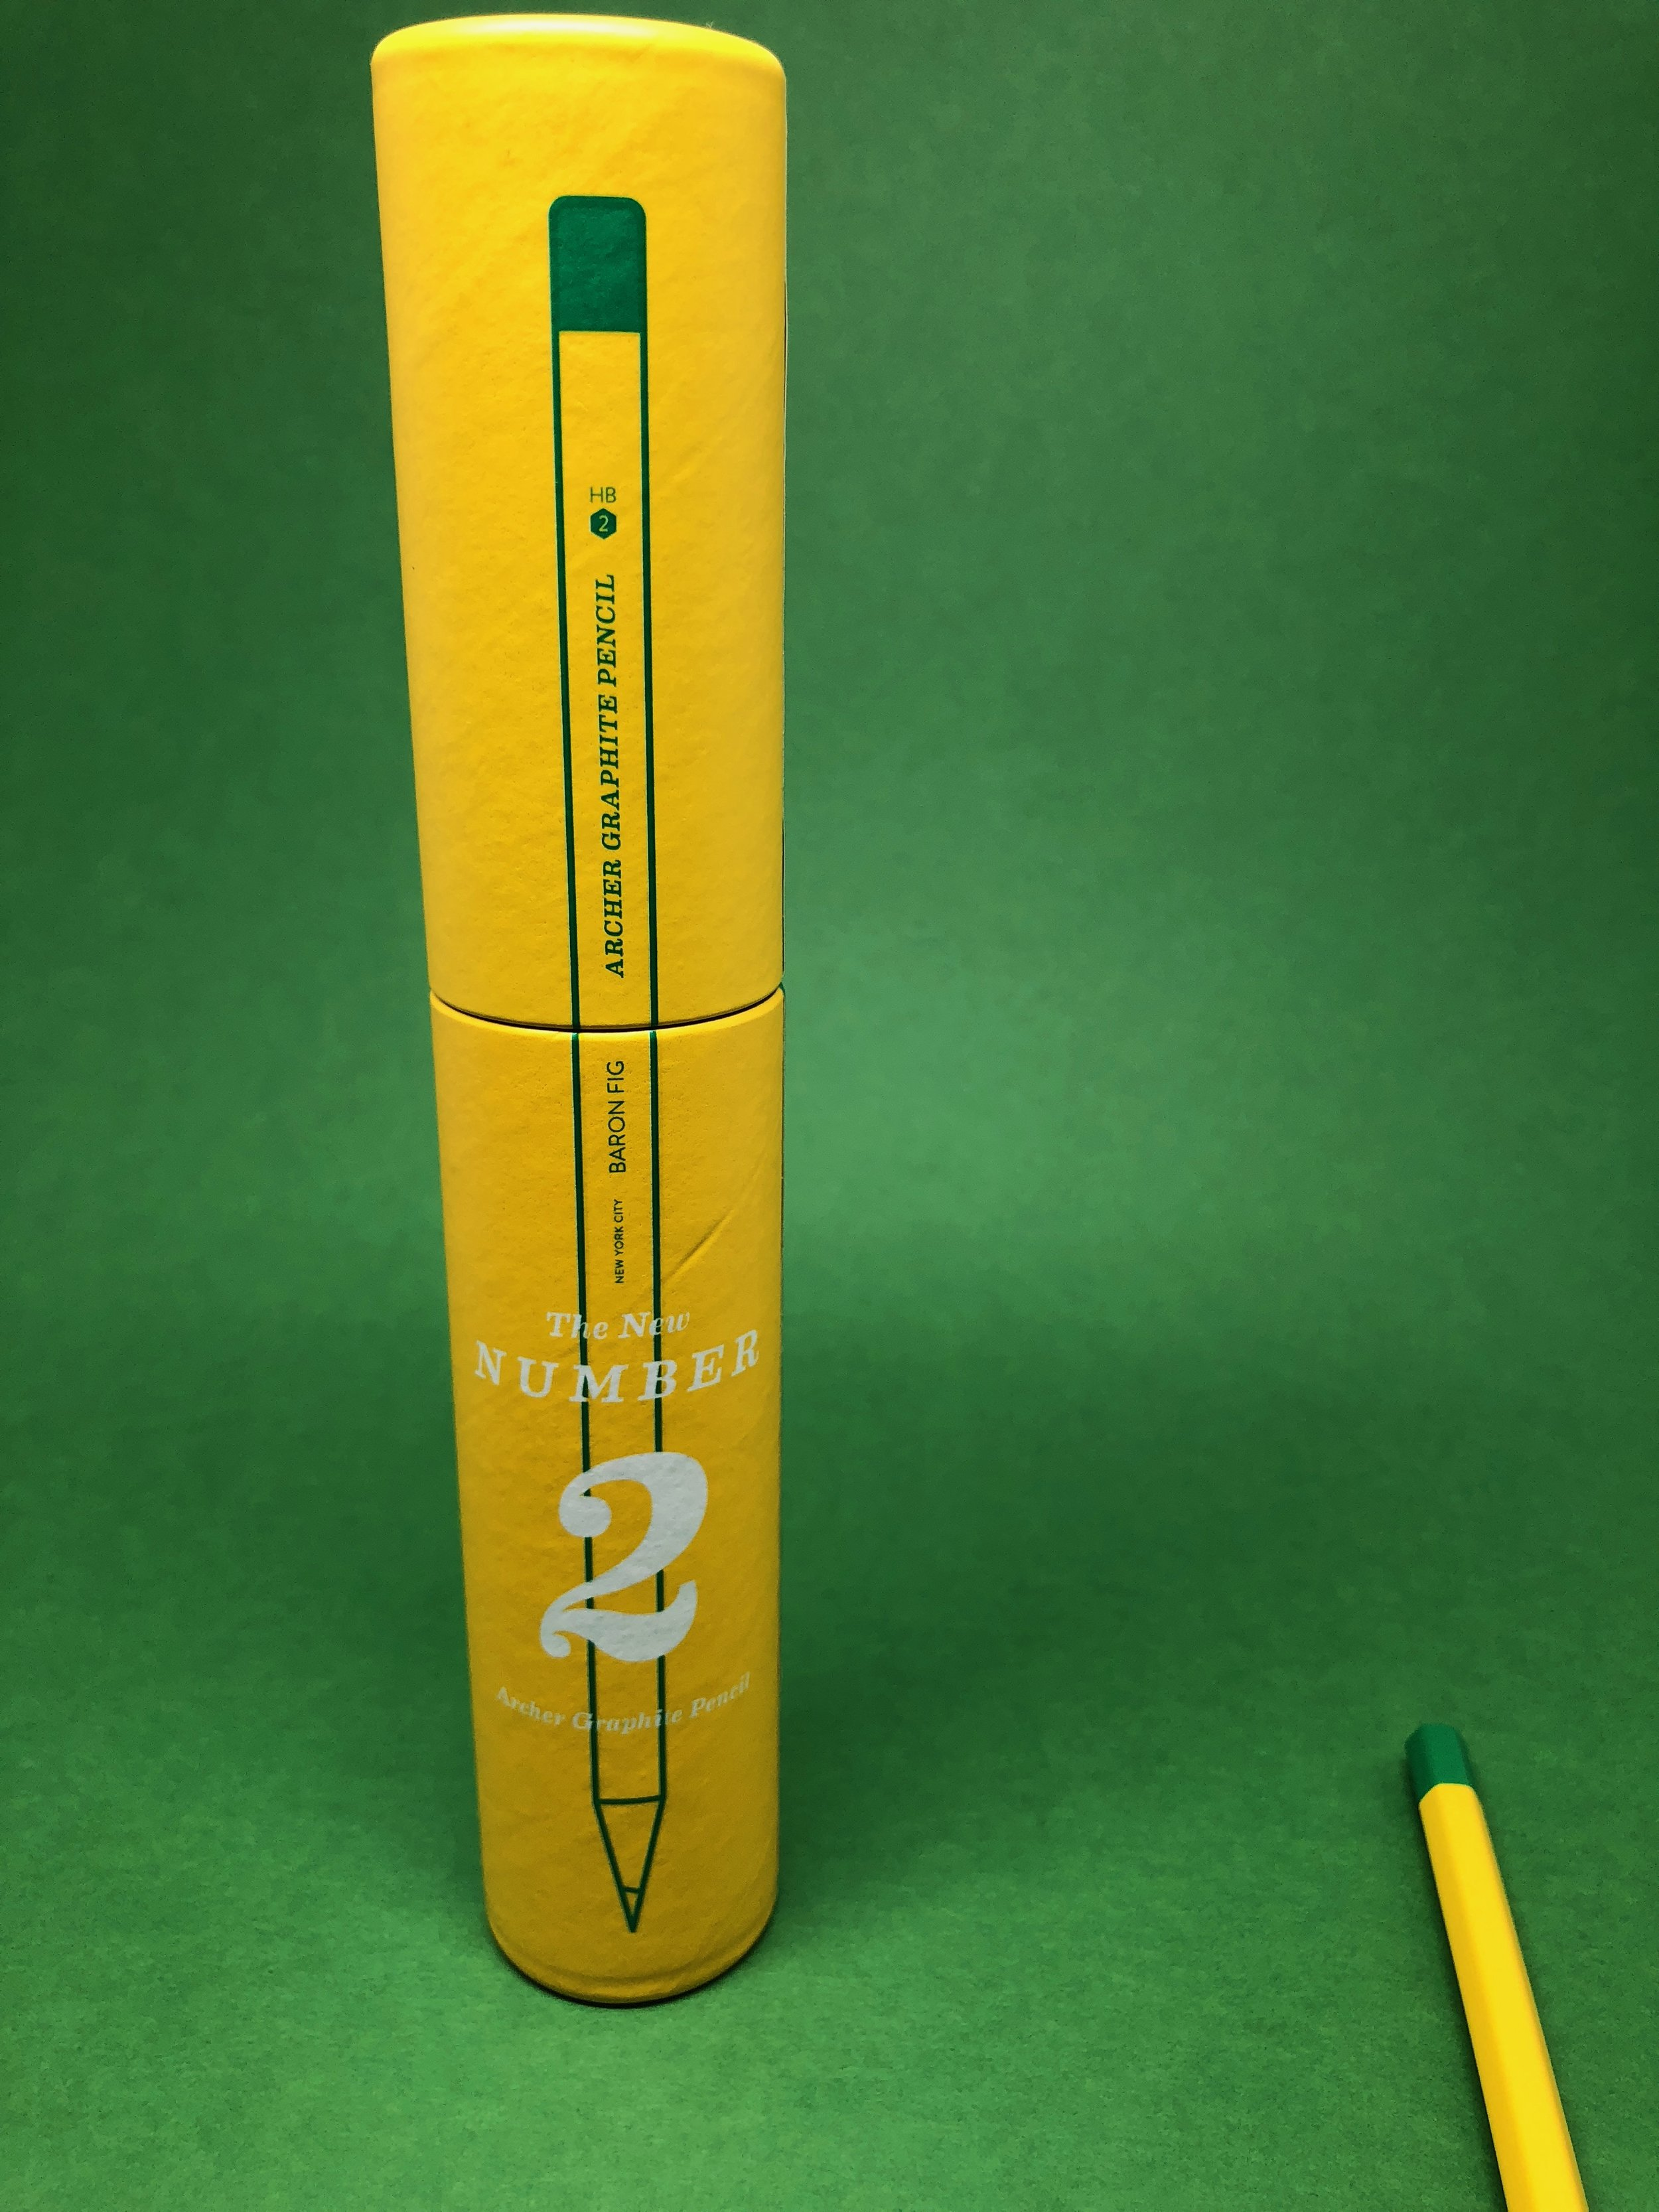 baron-fig-archer-school-pencil-1.jpg